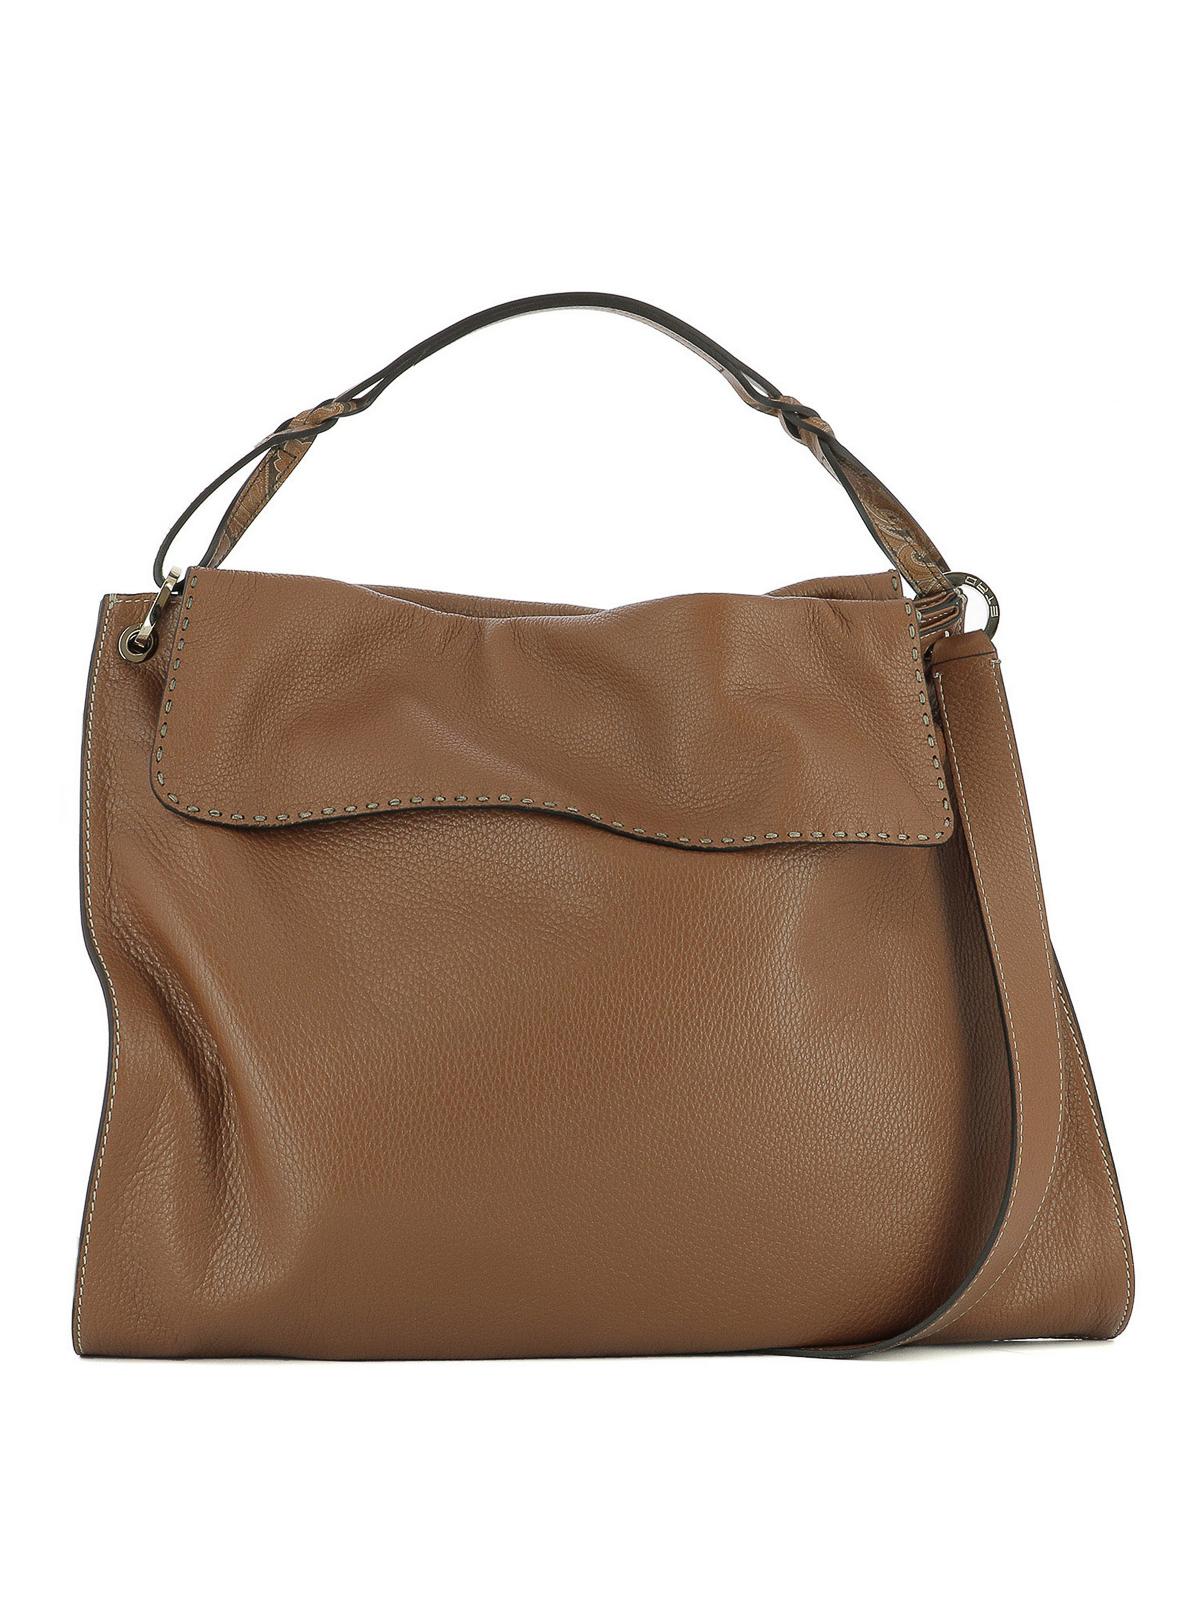 Etro Leather Shoulder Bag In Brown